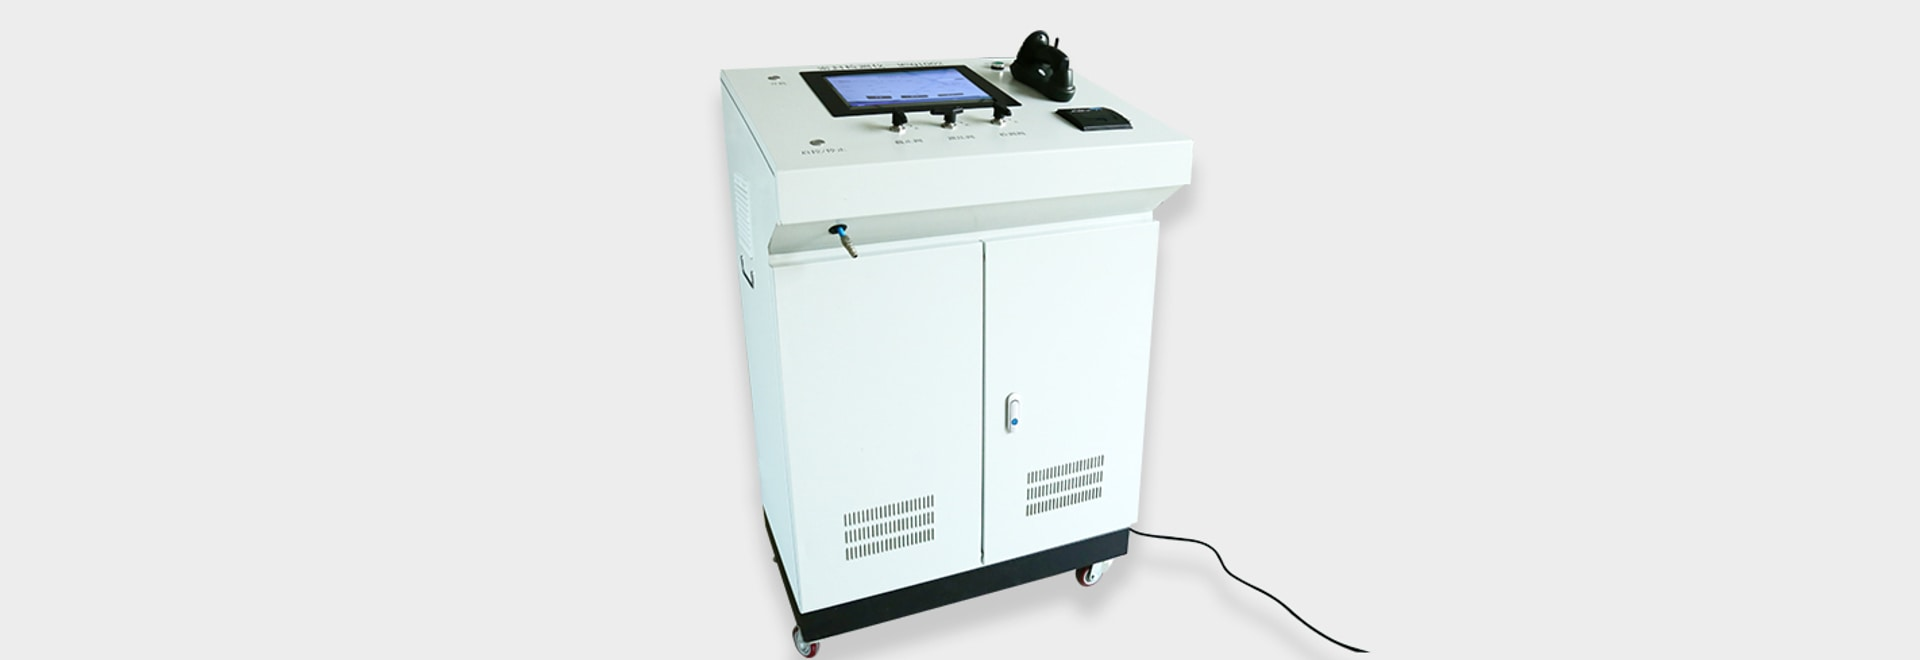 Differential Pressure Leak Detection Instrument